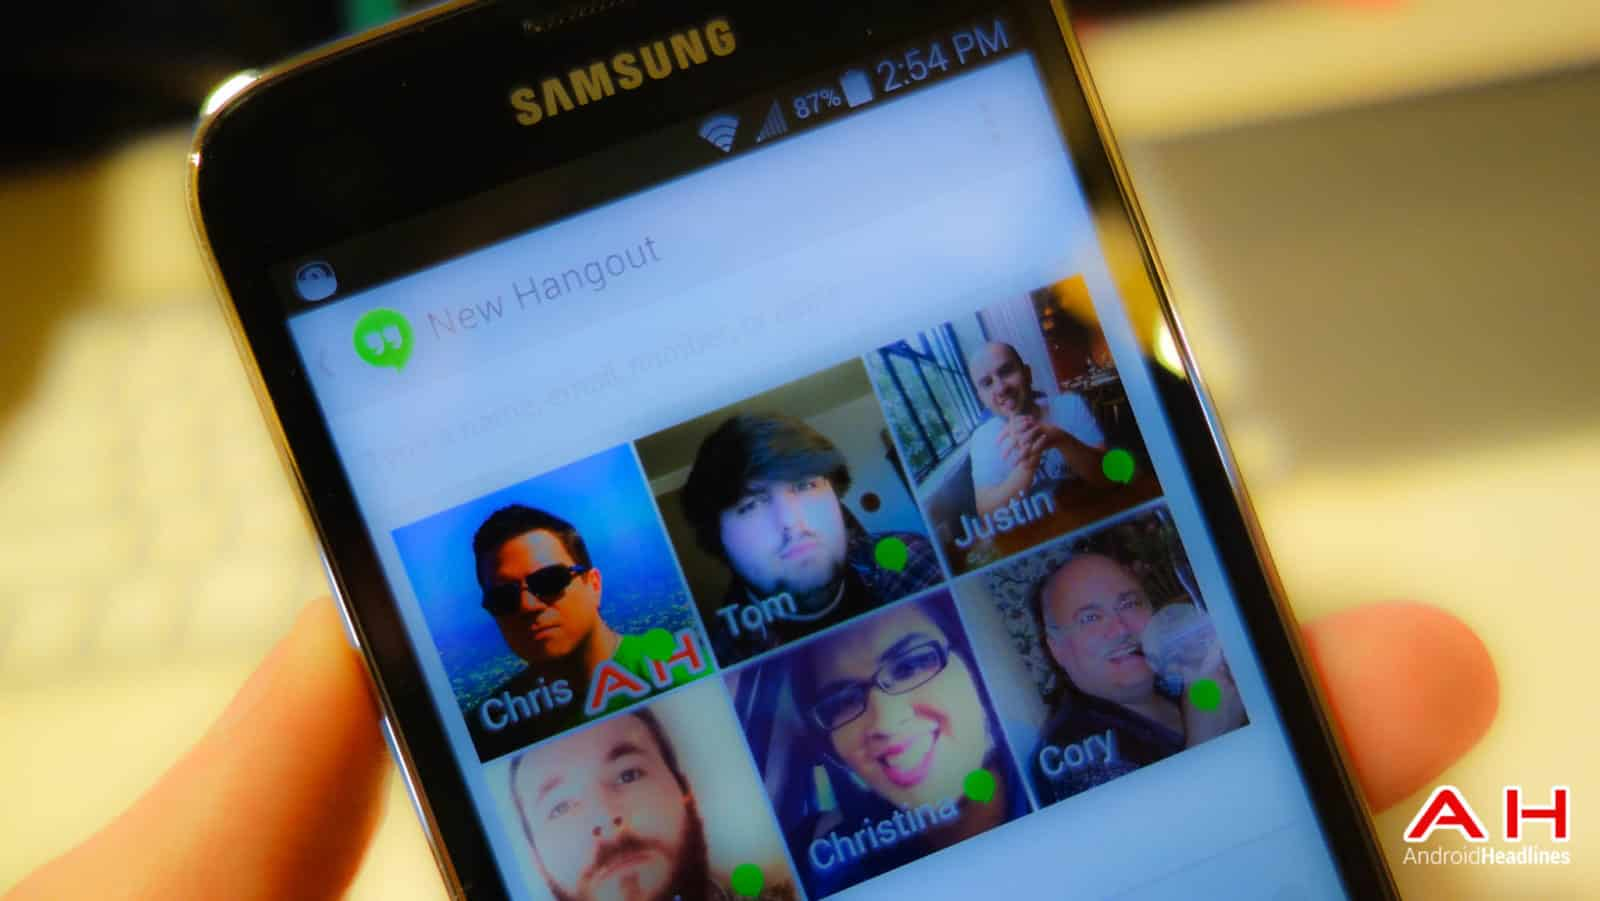 Samsung-Galaxy-S5-Hangouts-AH-1